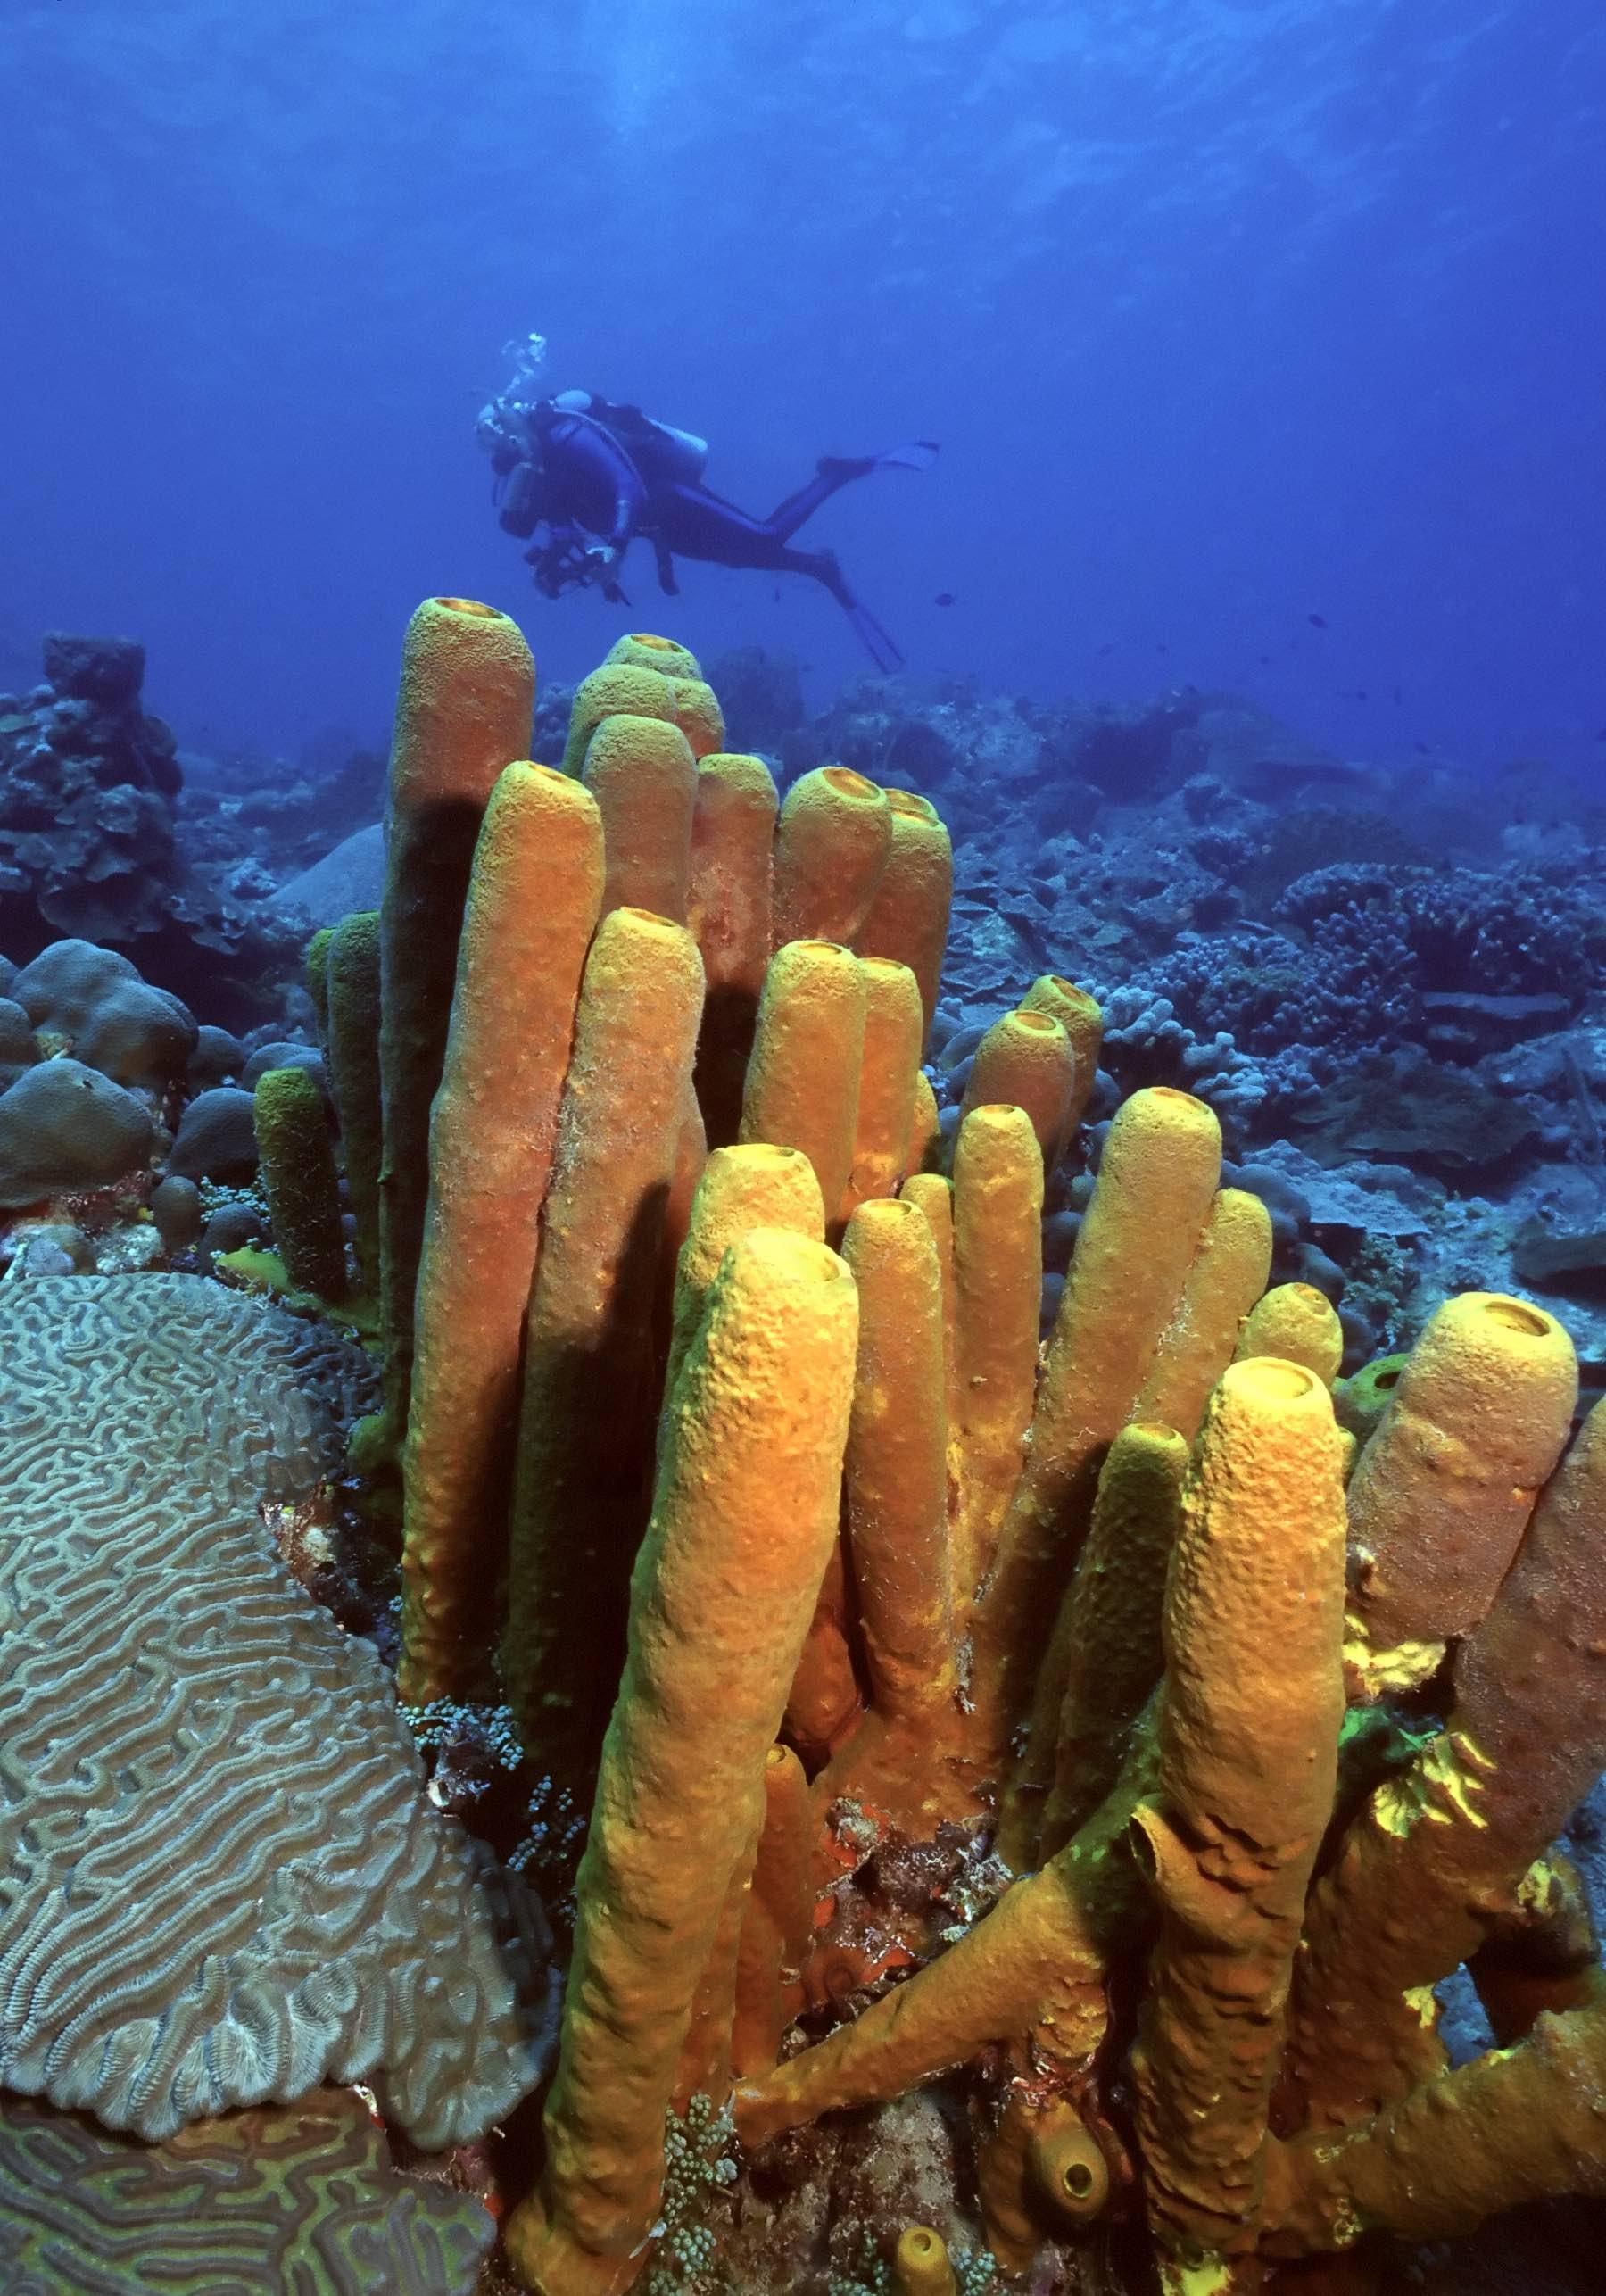 iStock_000000442534_Grenadines diving copy.jpg